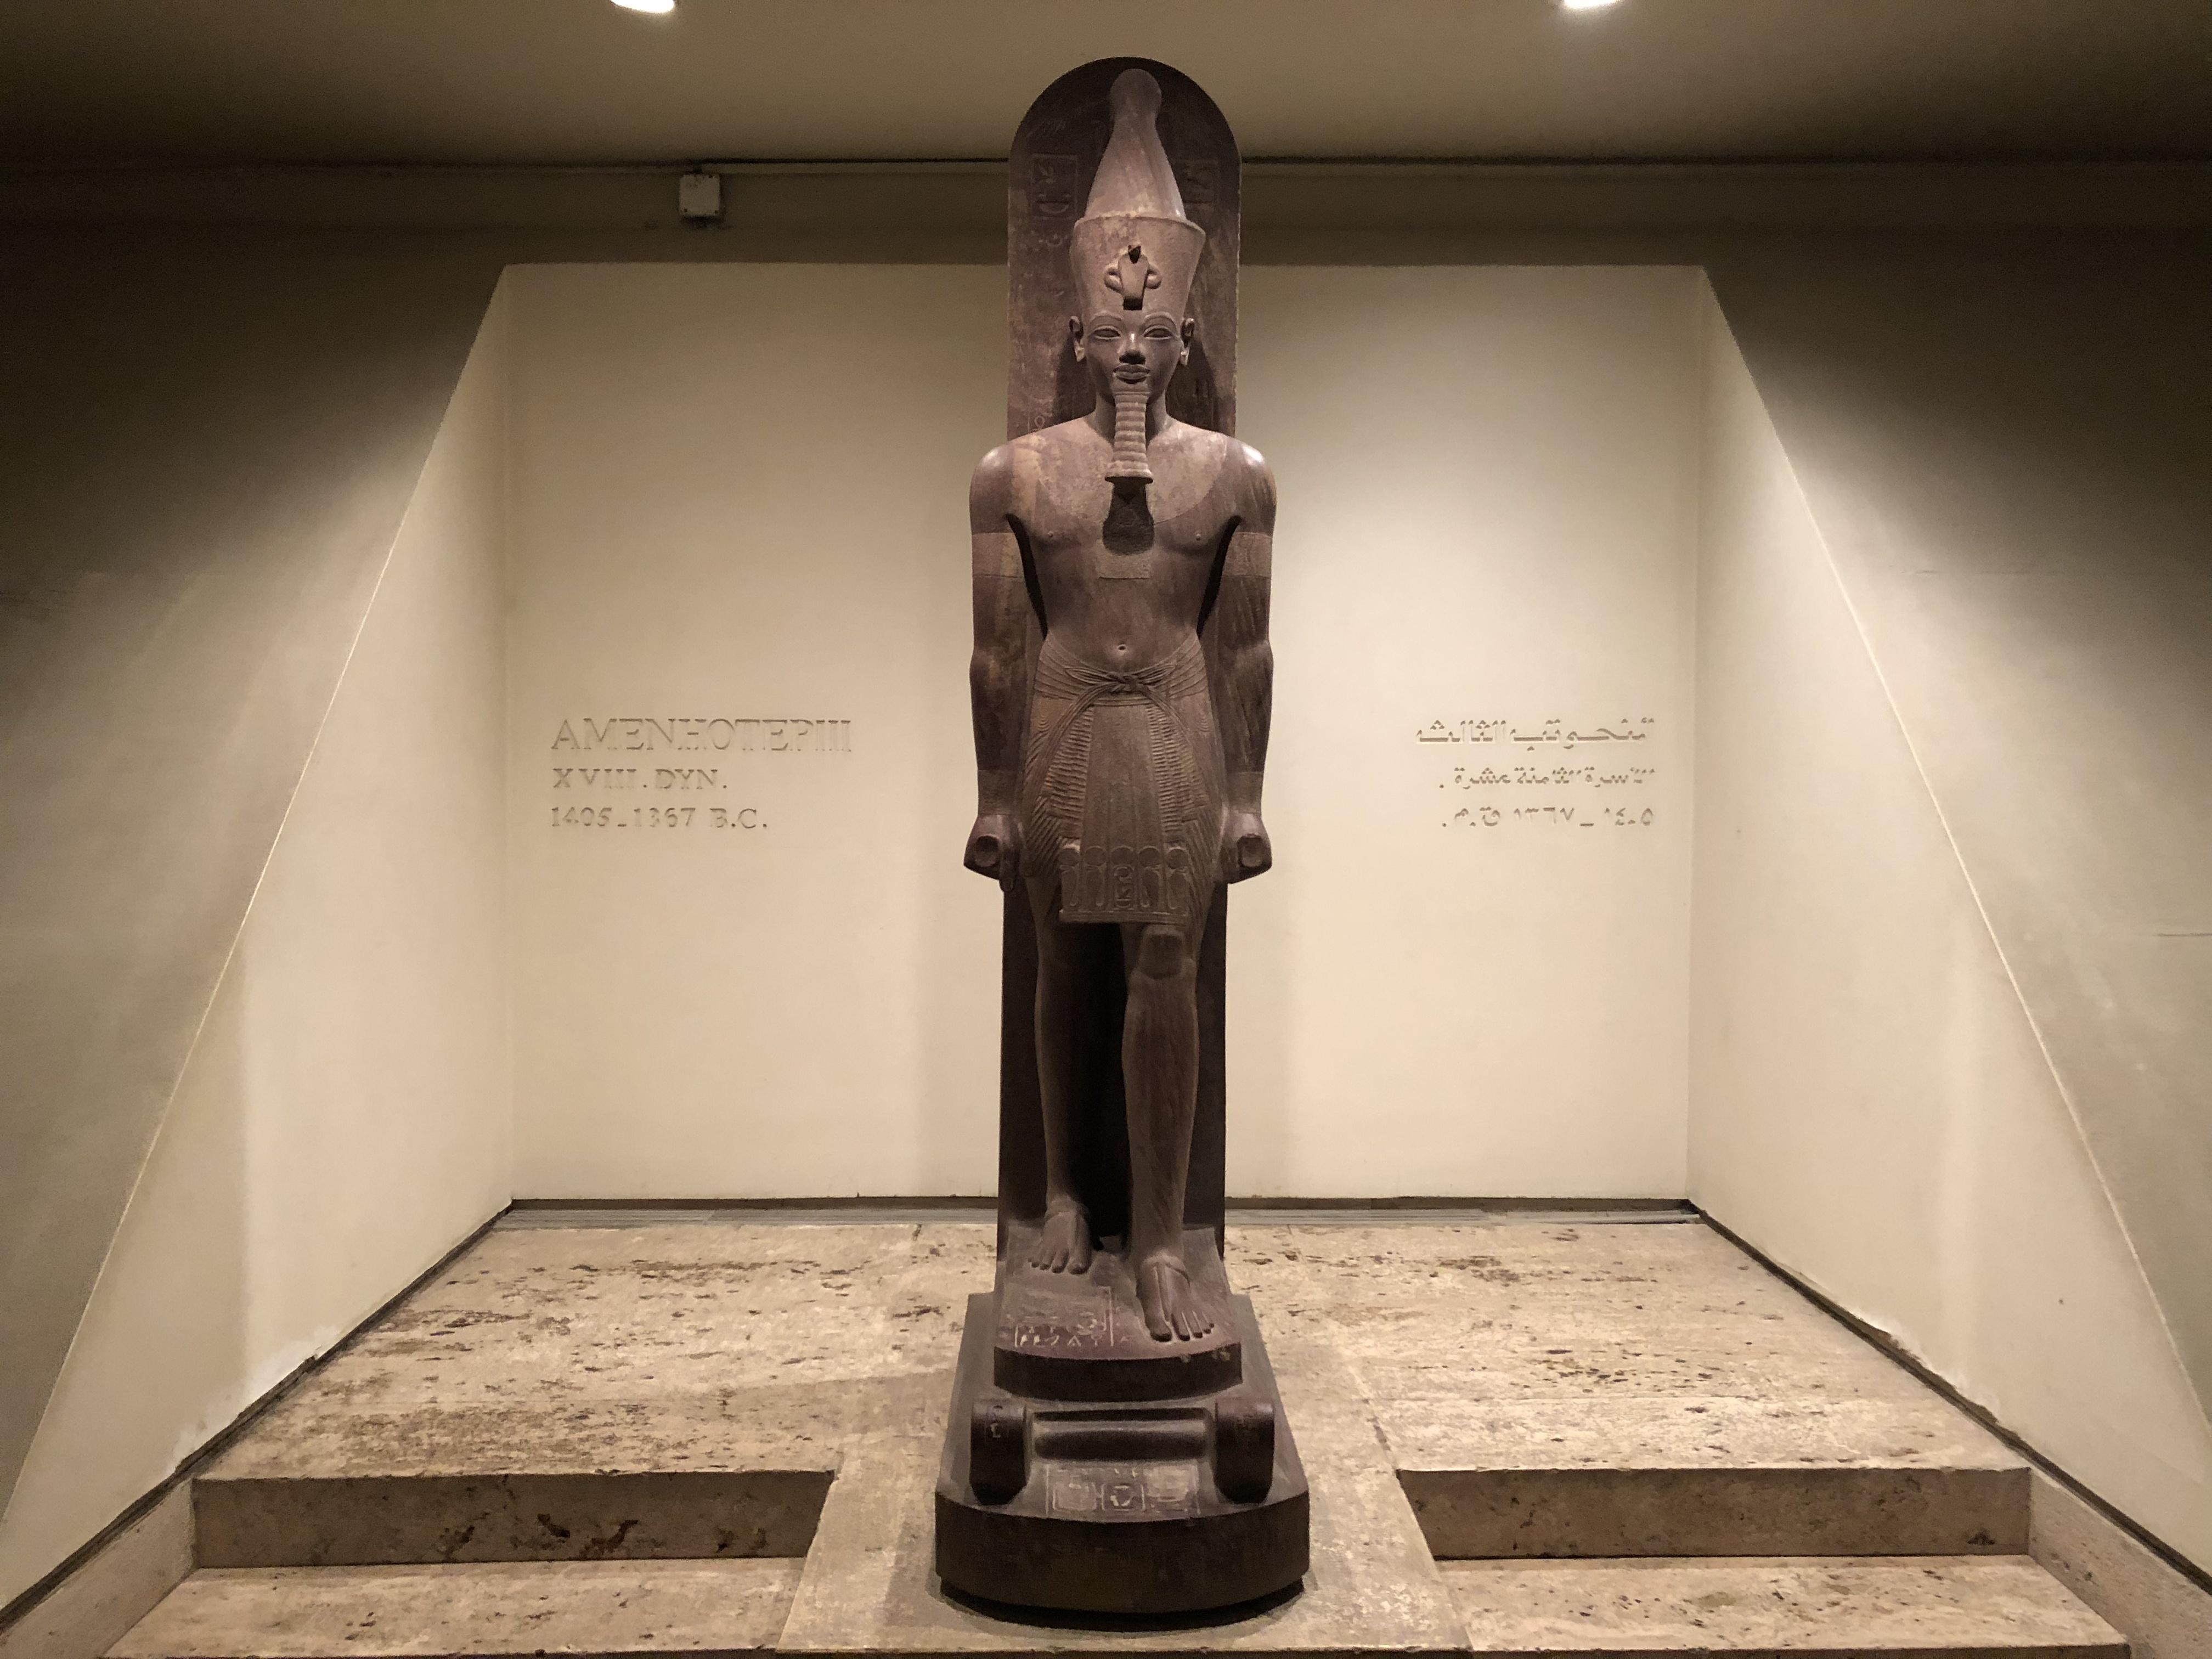 Amenhotep III Luxor cachette